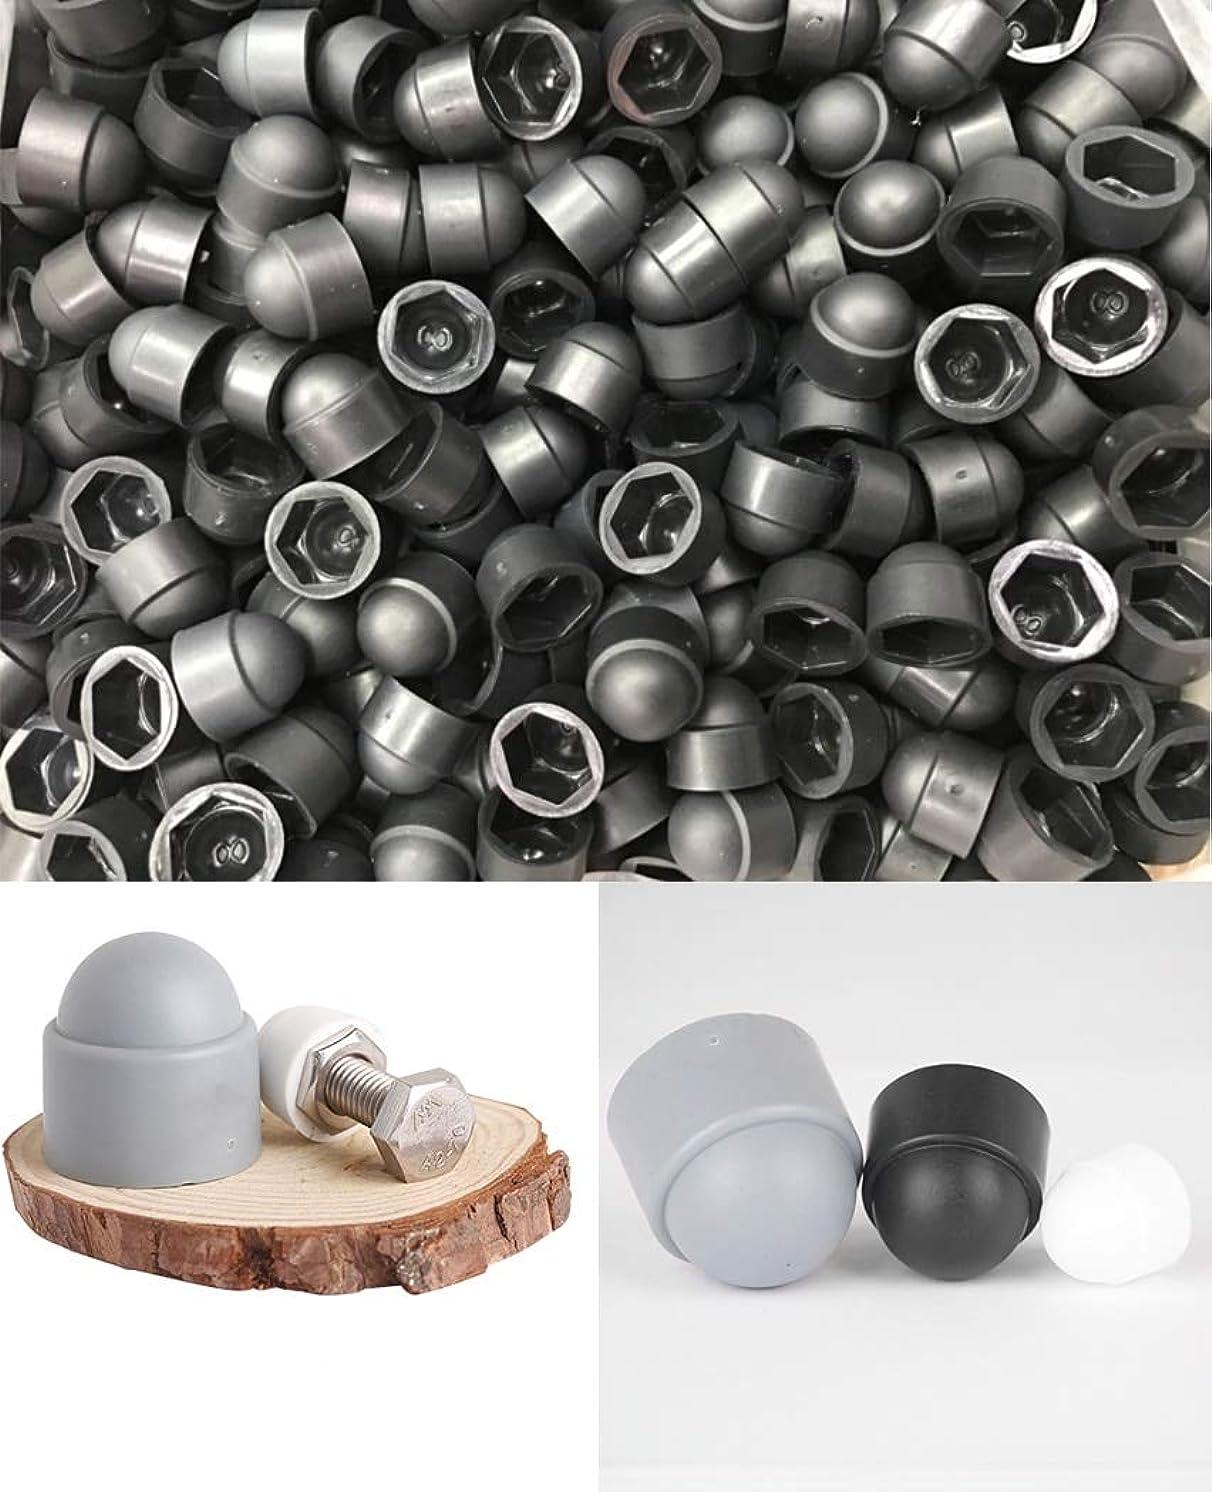 Nuts M14 M16 M18 M20 M22 M24 m27 M30 M36 Steel Nut hex Bolt Cover Cap Plastic pp Protector Corrosion dust Proof Drive Hole Plug - (Size: M27X41, Color: White)